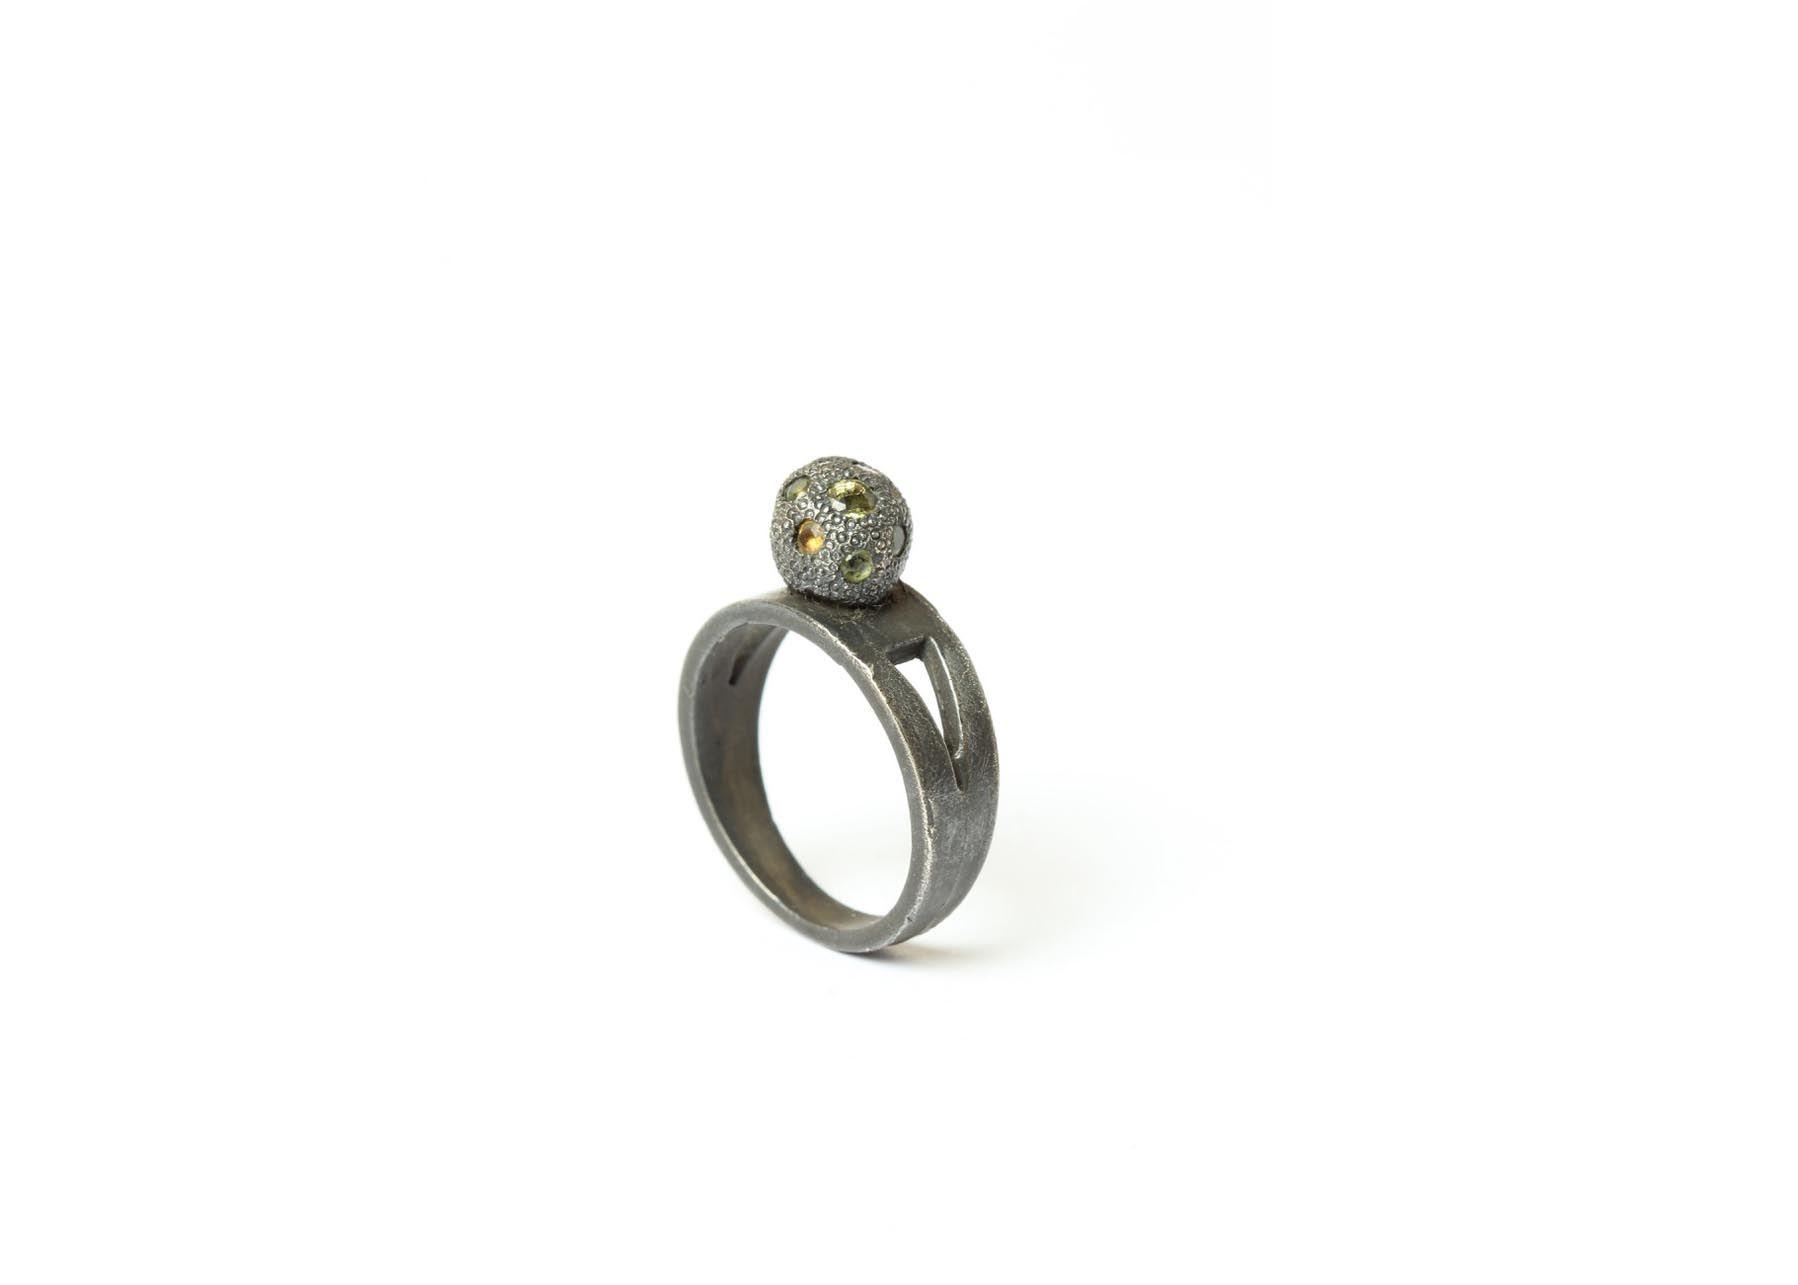 Karl Fritsch, Rings, German Design, New Zealand